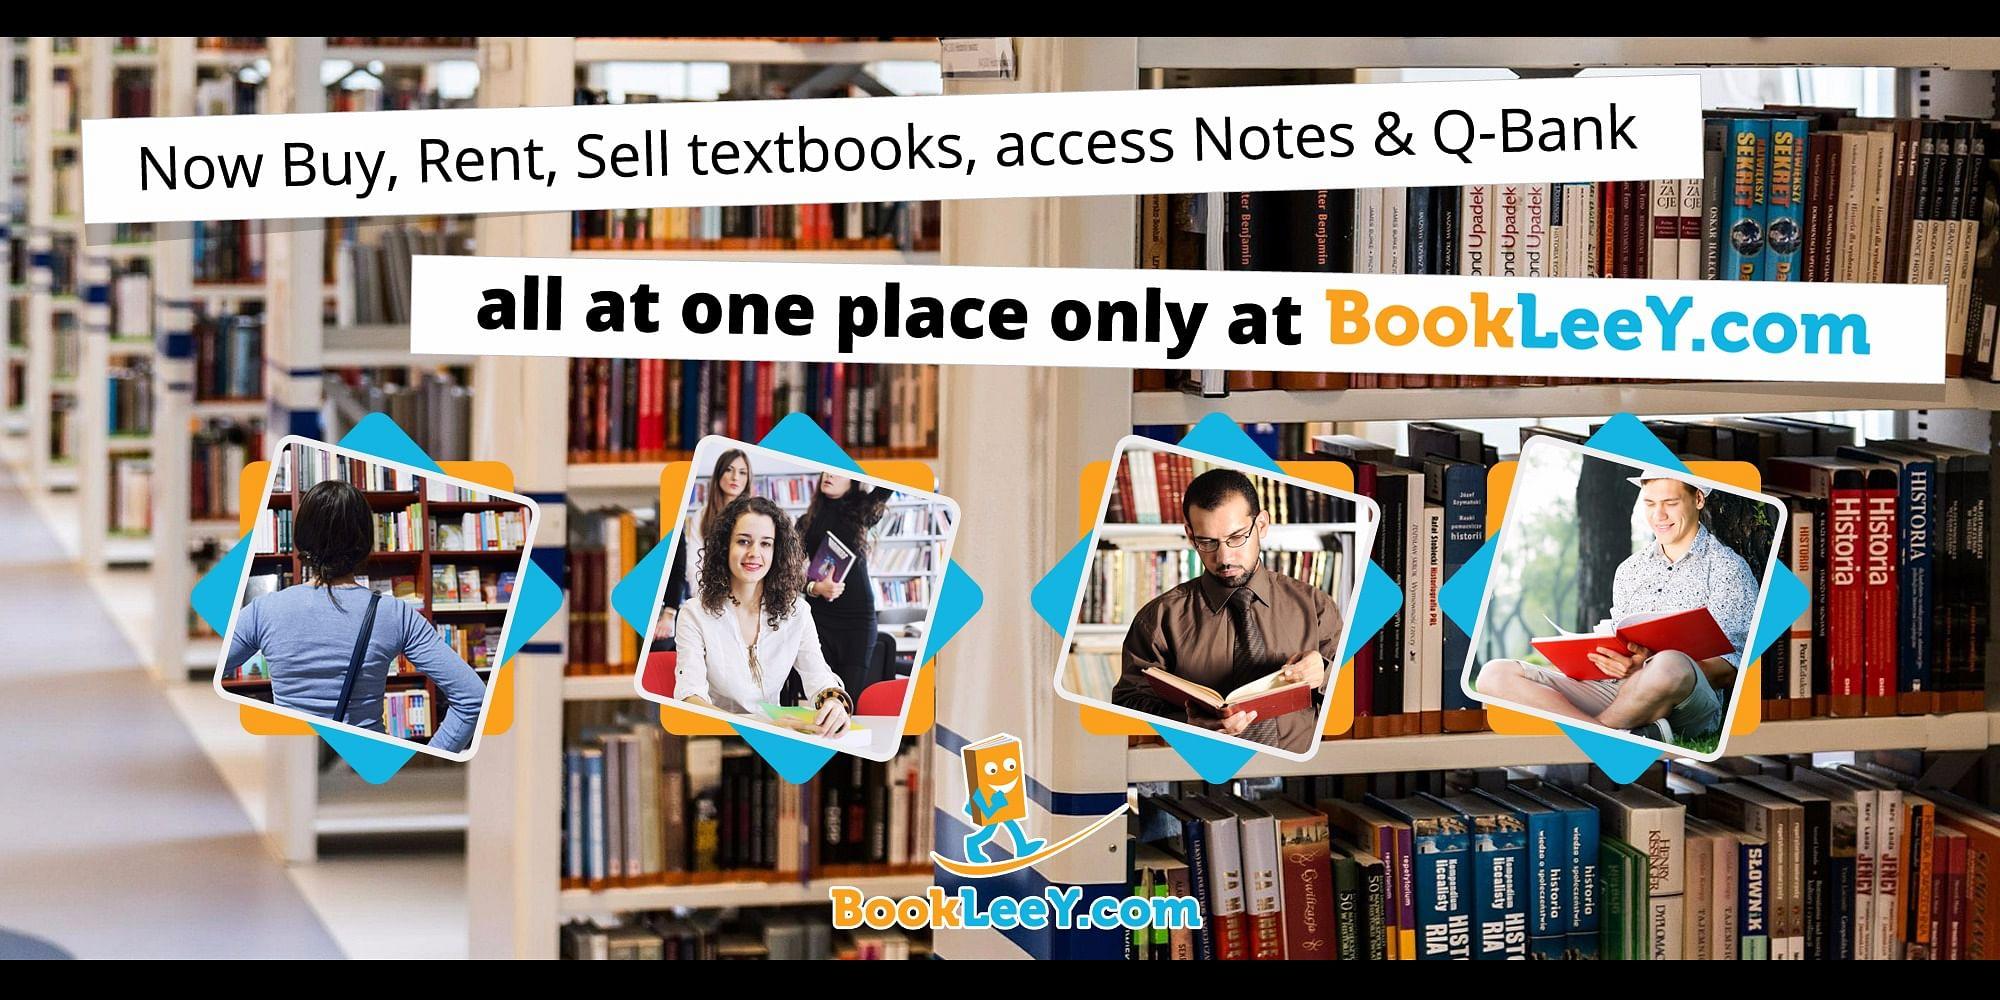 BookLeey dedicated website for students